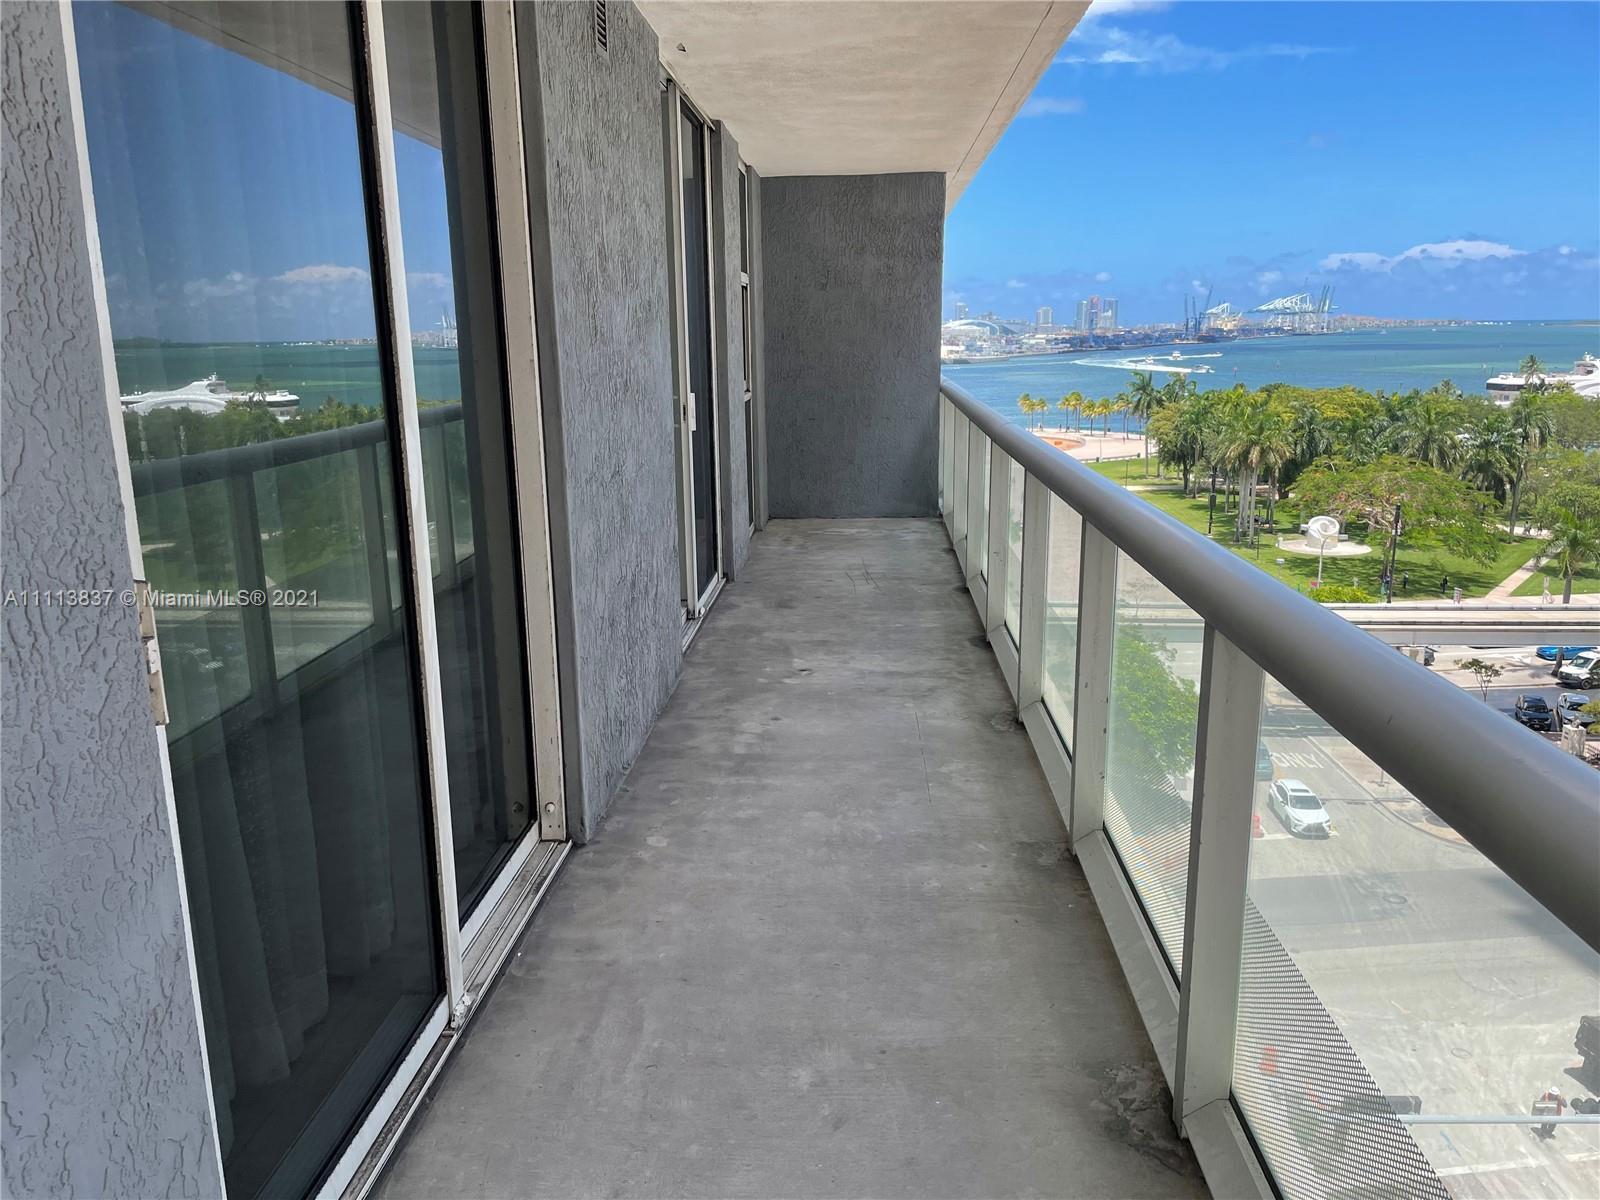 50 Biscayne #814 - 50 BISCAYNE BL #814, Miami, FL 33132